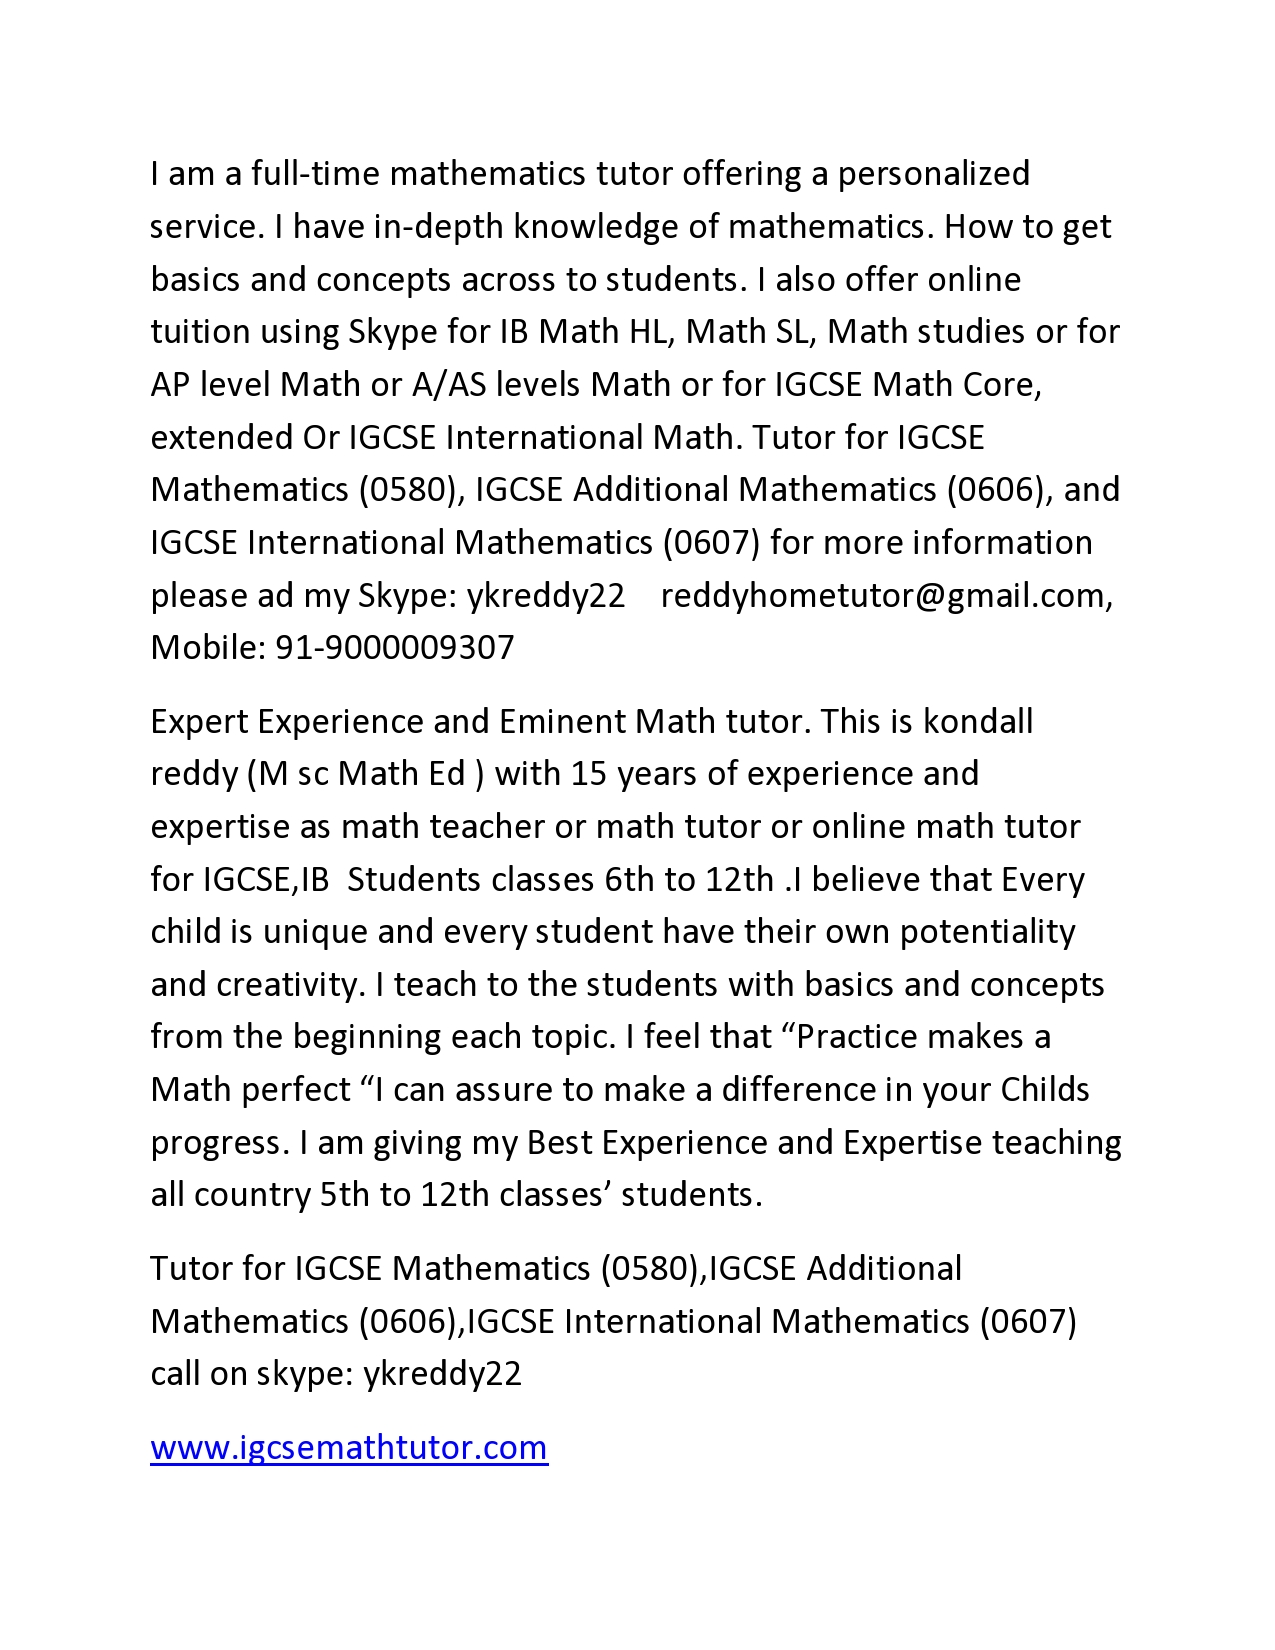 I offer online tuition using Skype for IB Math HL, Math SL, Math ...